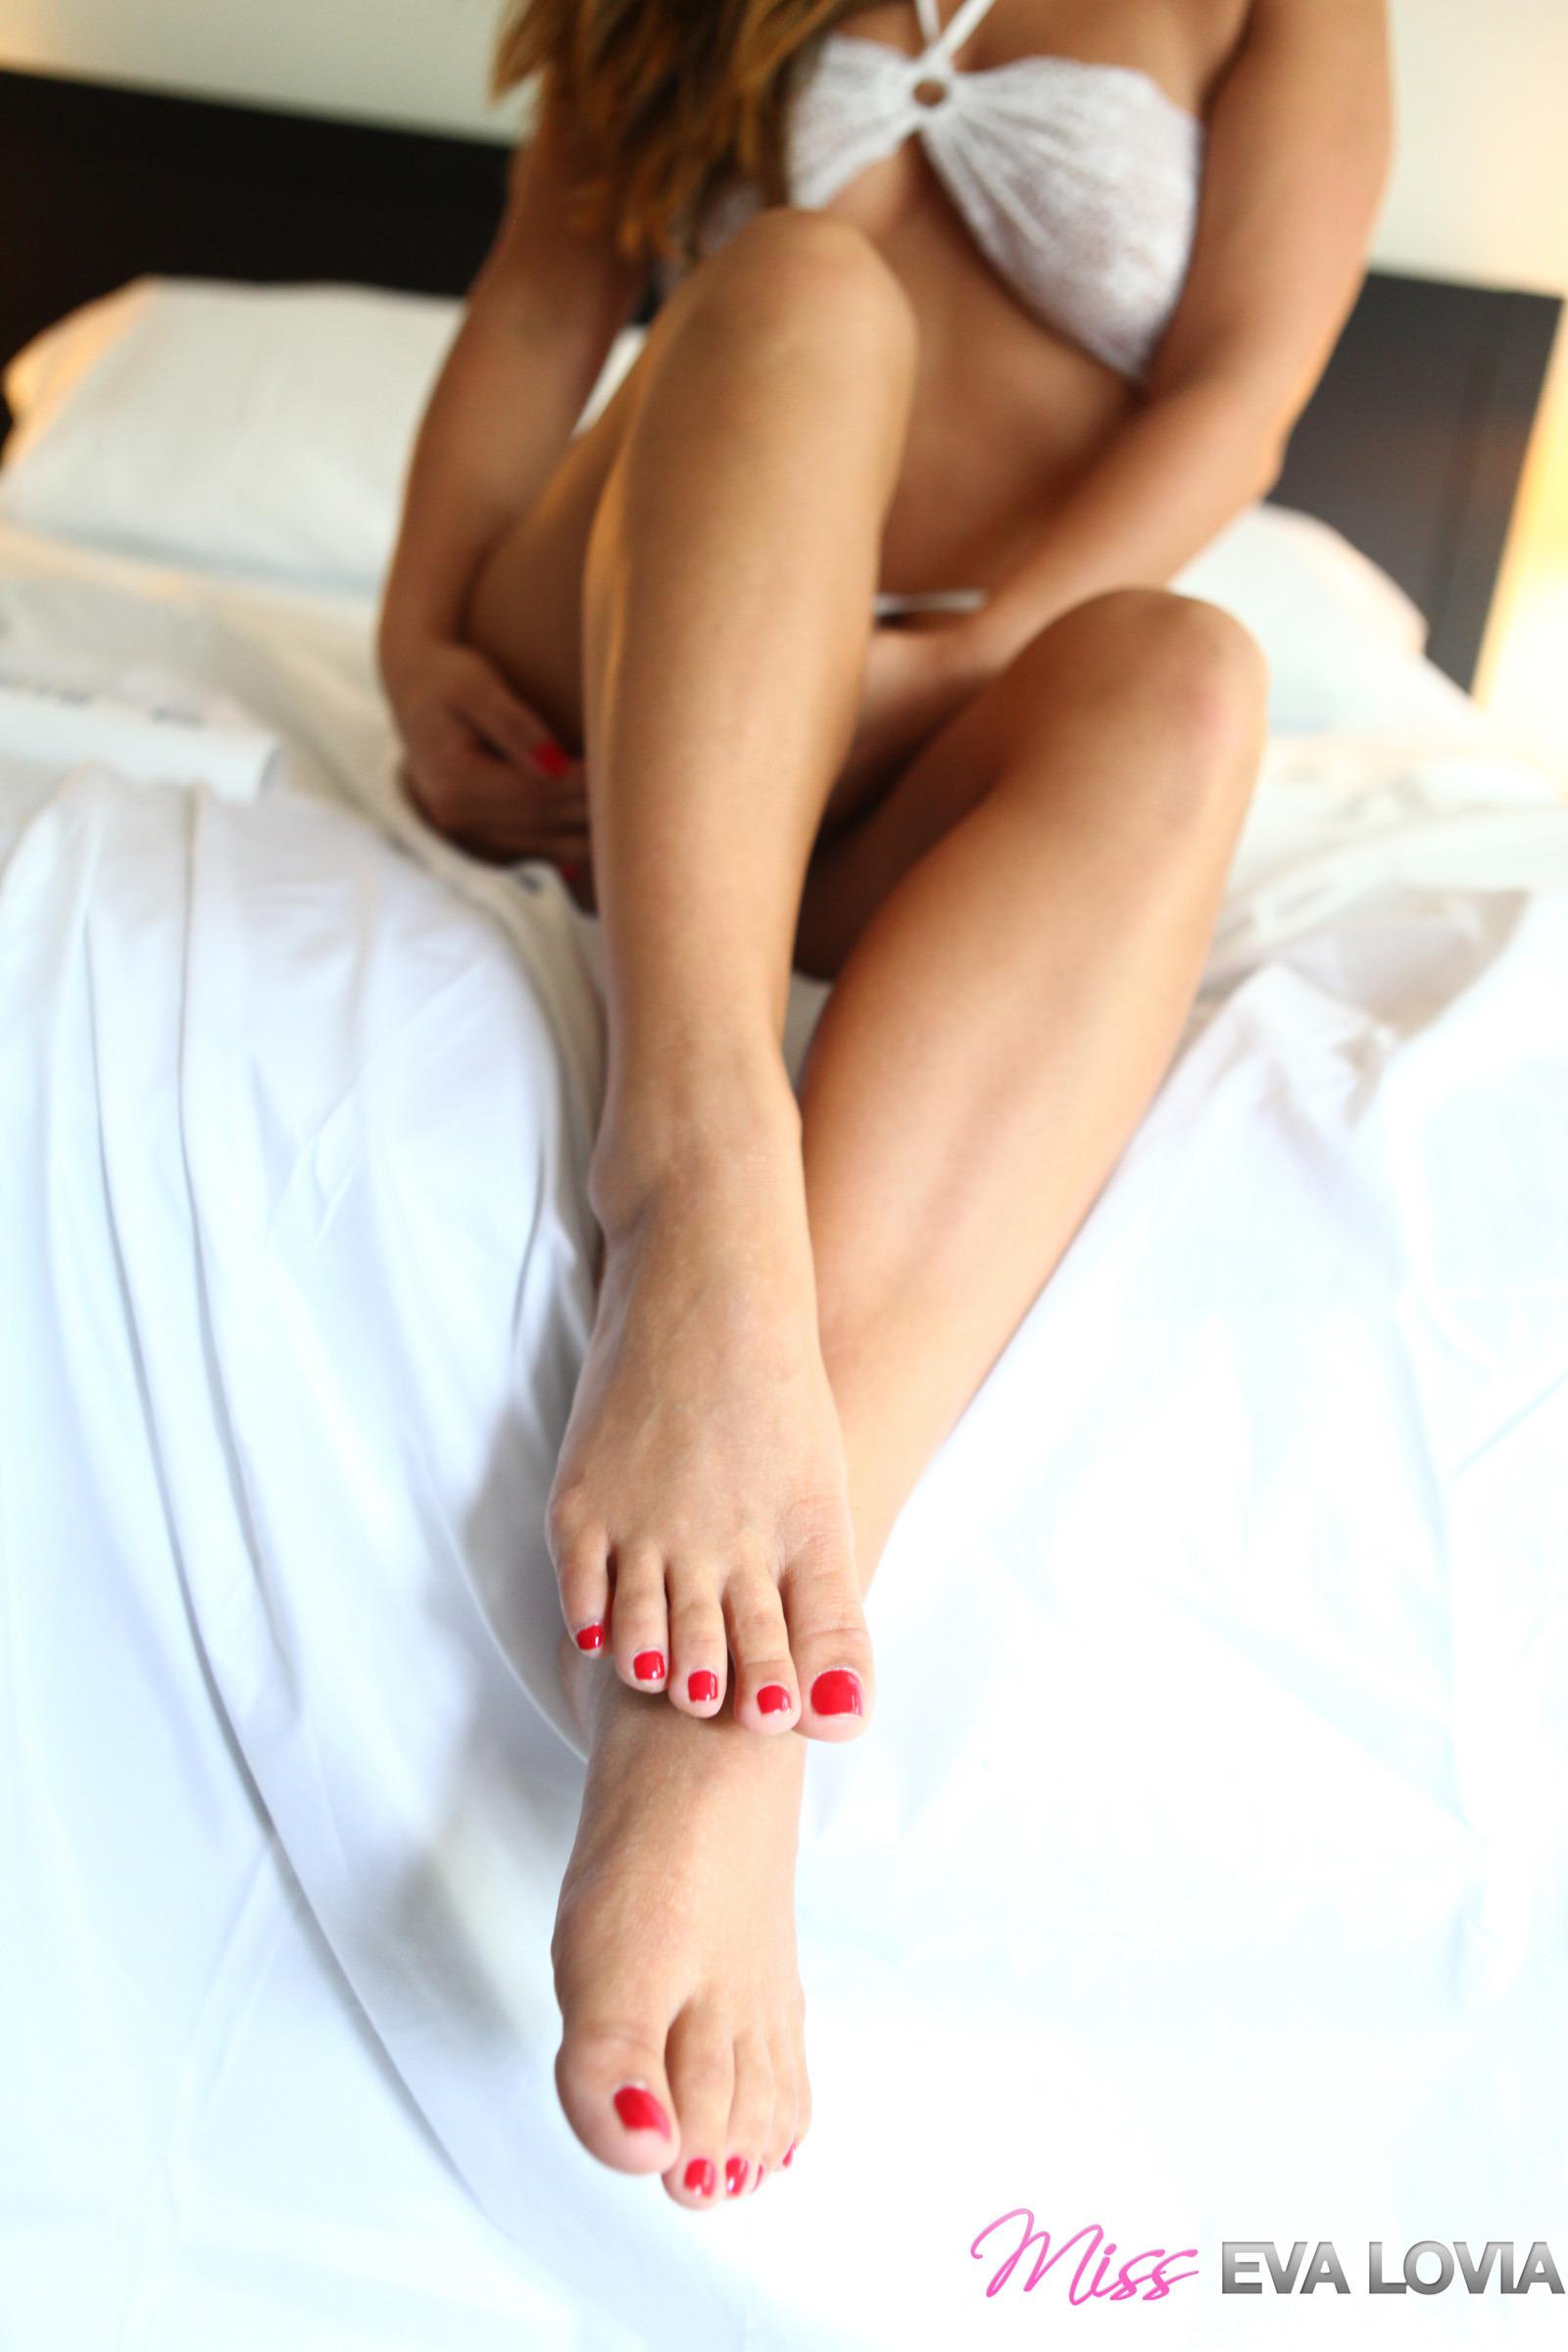 Los pies de Eva Lovia - Imágenes en Taringa!